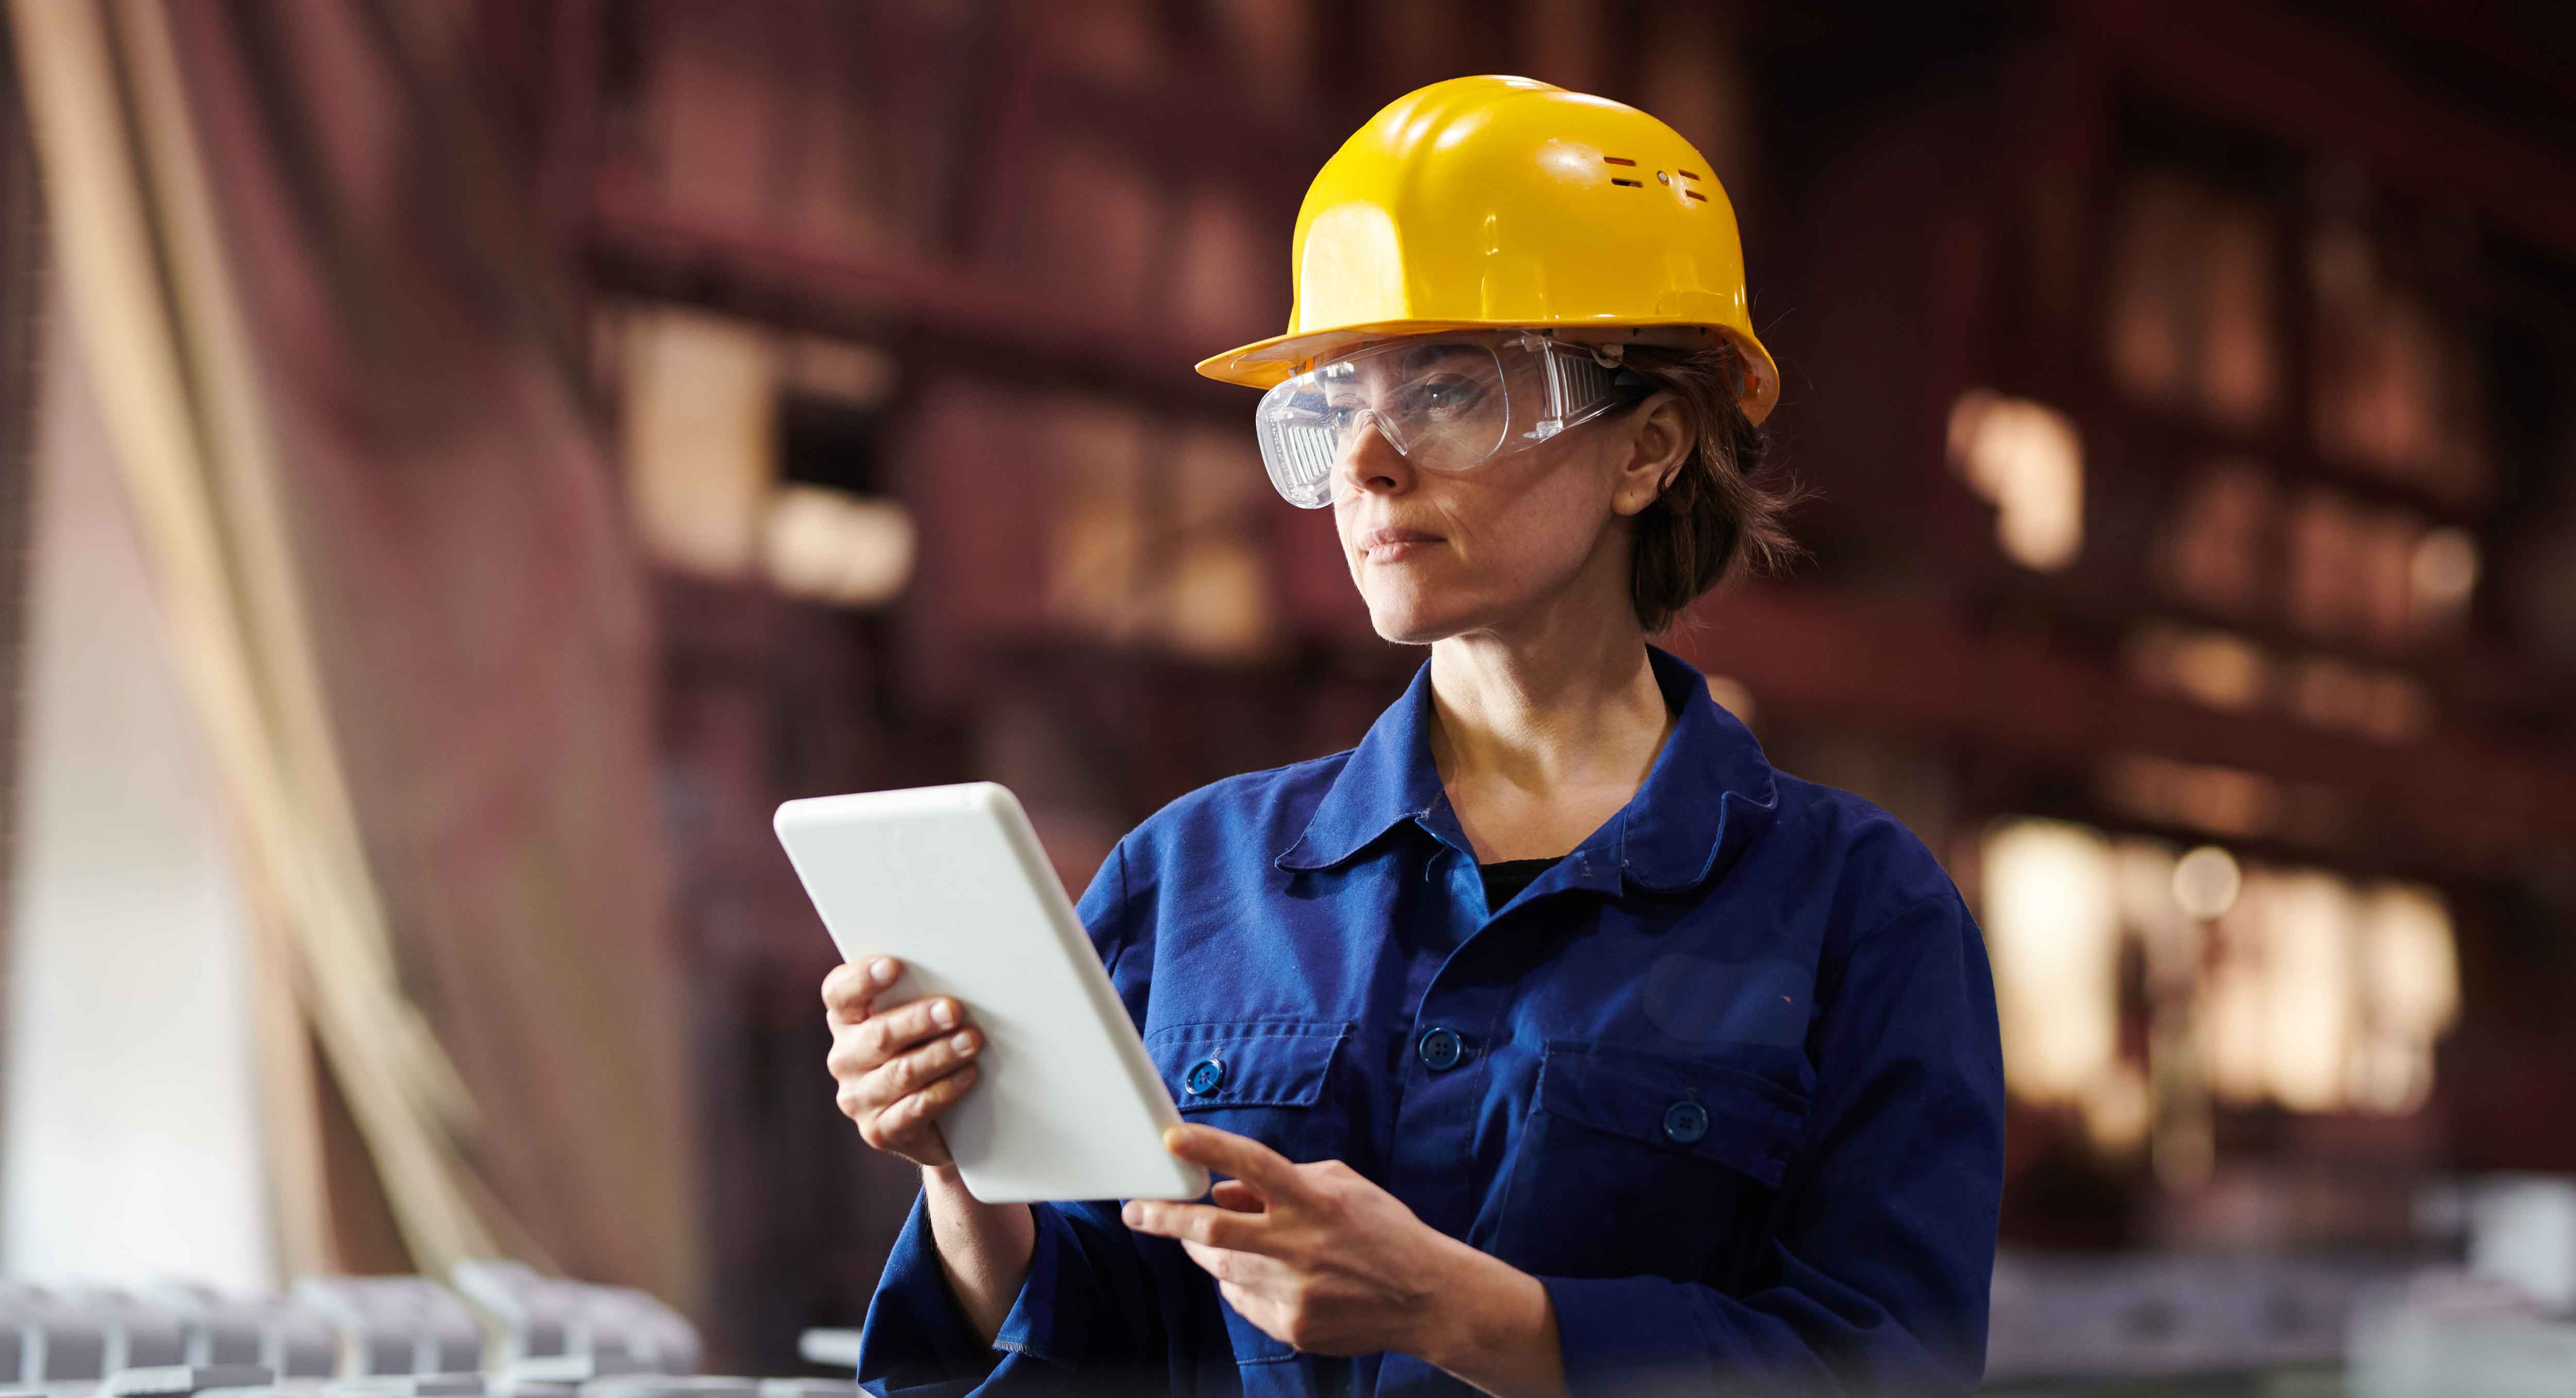 modern-female-worker